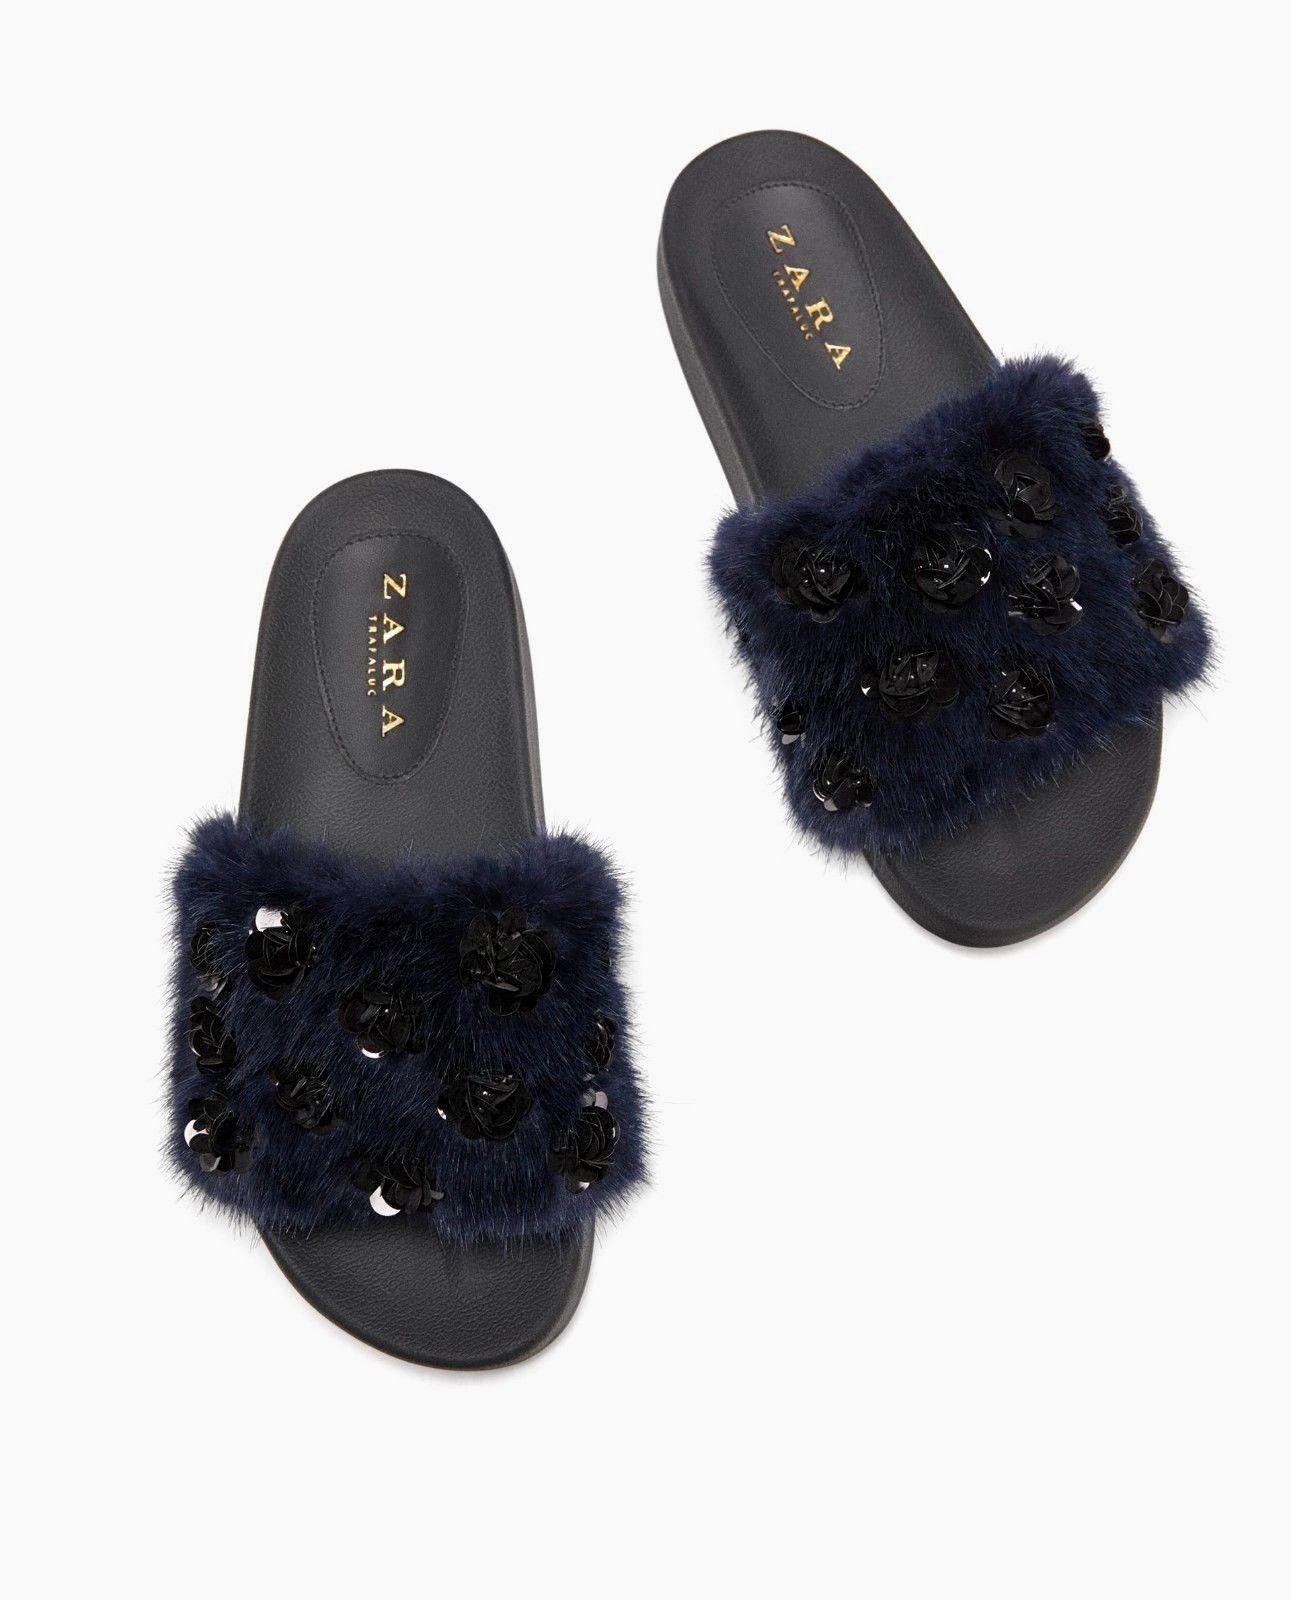 Zara Bleu Marine fausse fourrure Embelli Mule Slides Sandales Plates Taille UK 4 EU 37 USA 6,5